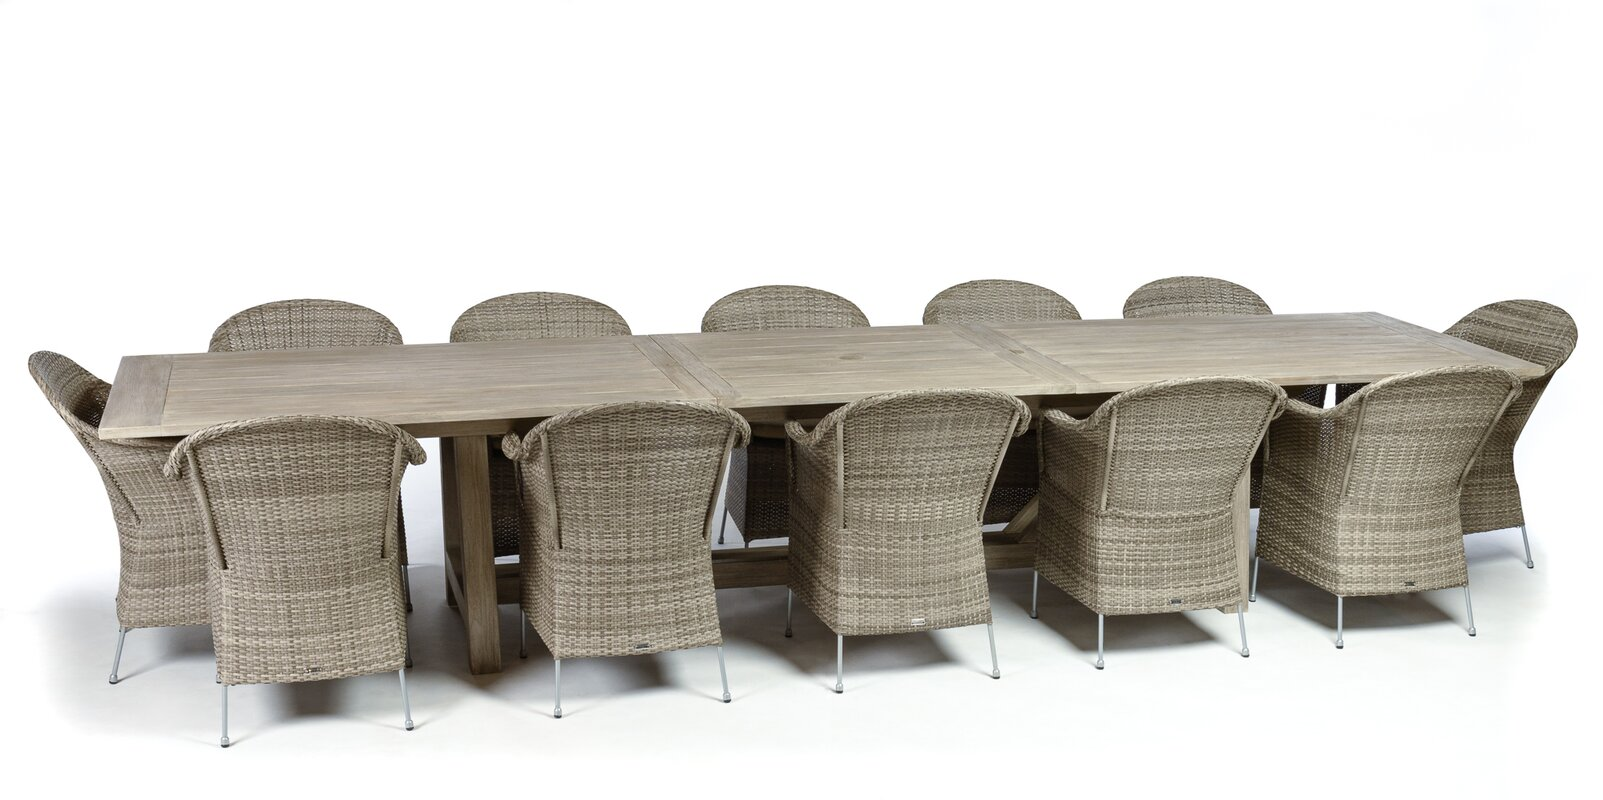 co9 design lakewood 9 piece extension trestle table dining set default name